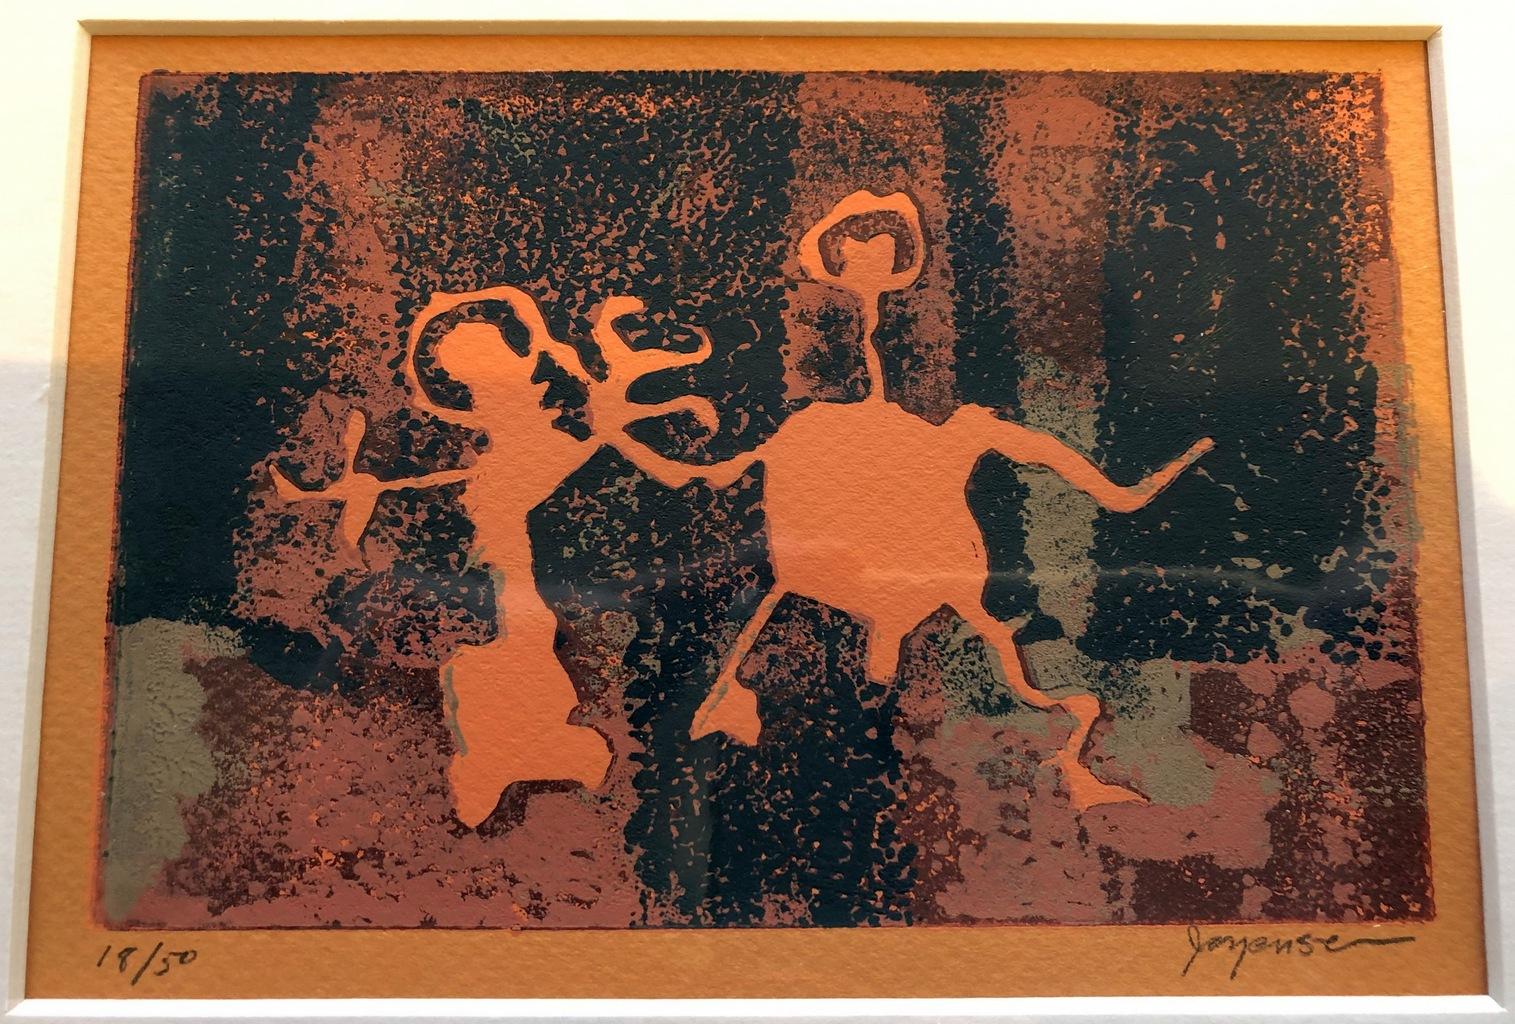 Block Prints - Steve Jorgensen